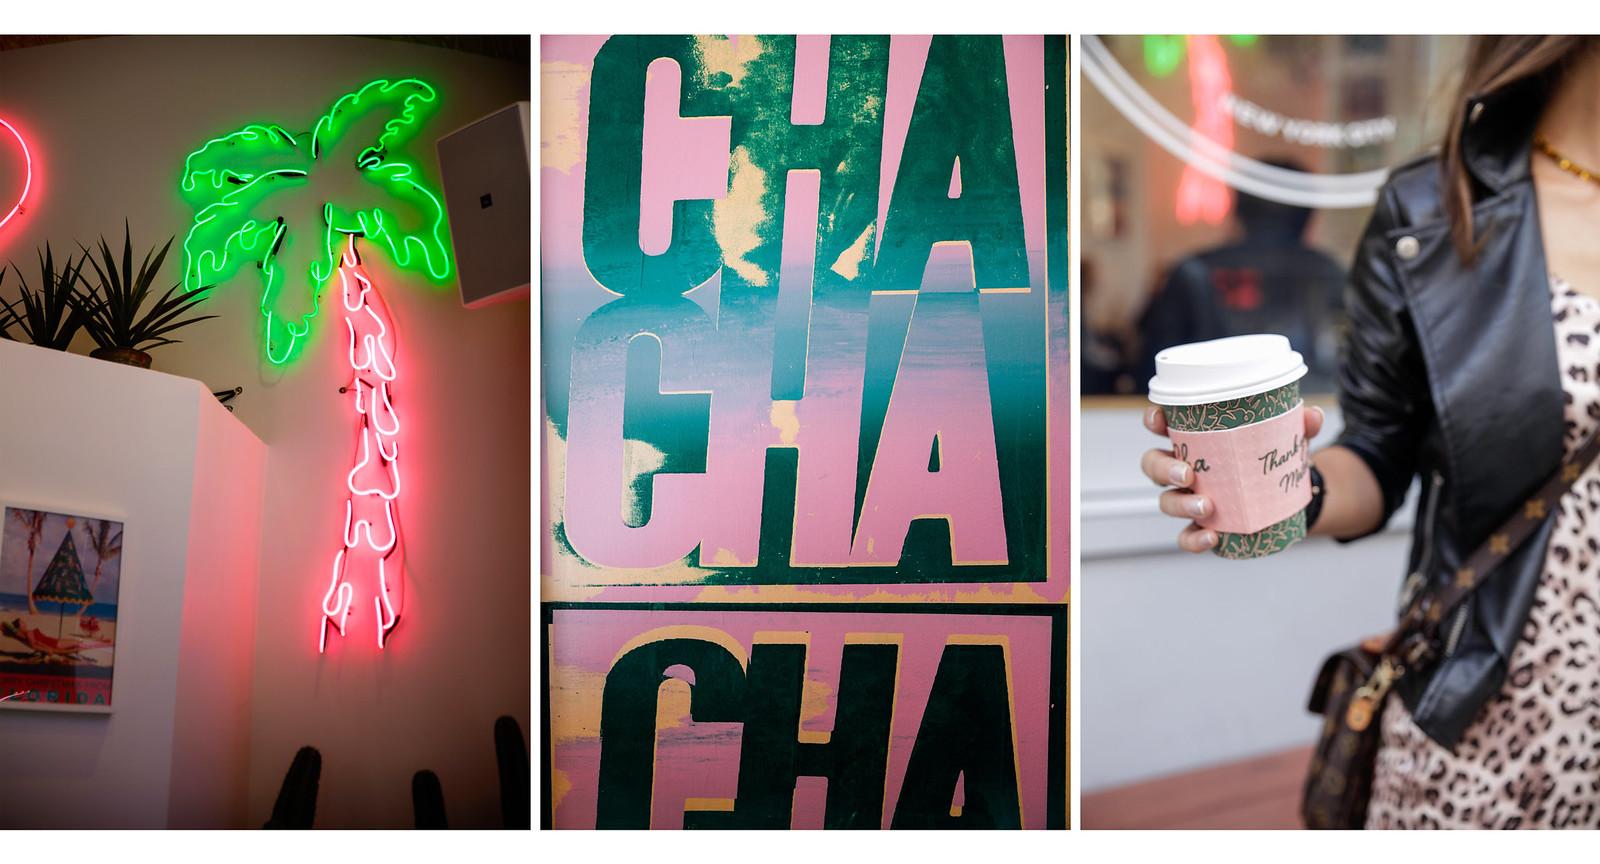 06_cha_cha_matcha_cafeteria_rosa_nueva_york_el_mejor_matcha_unicorn_croissant_breakfast_theguestgirl_nyc